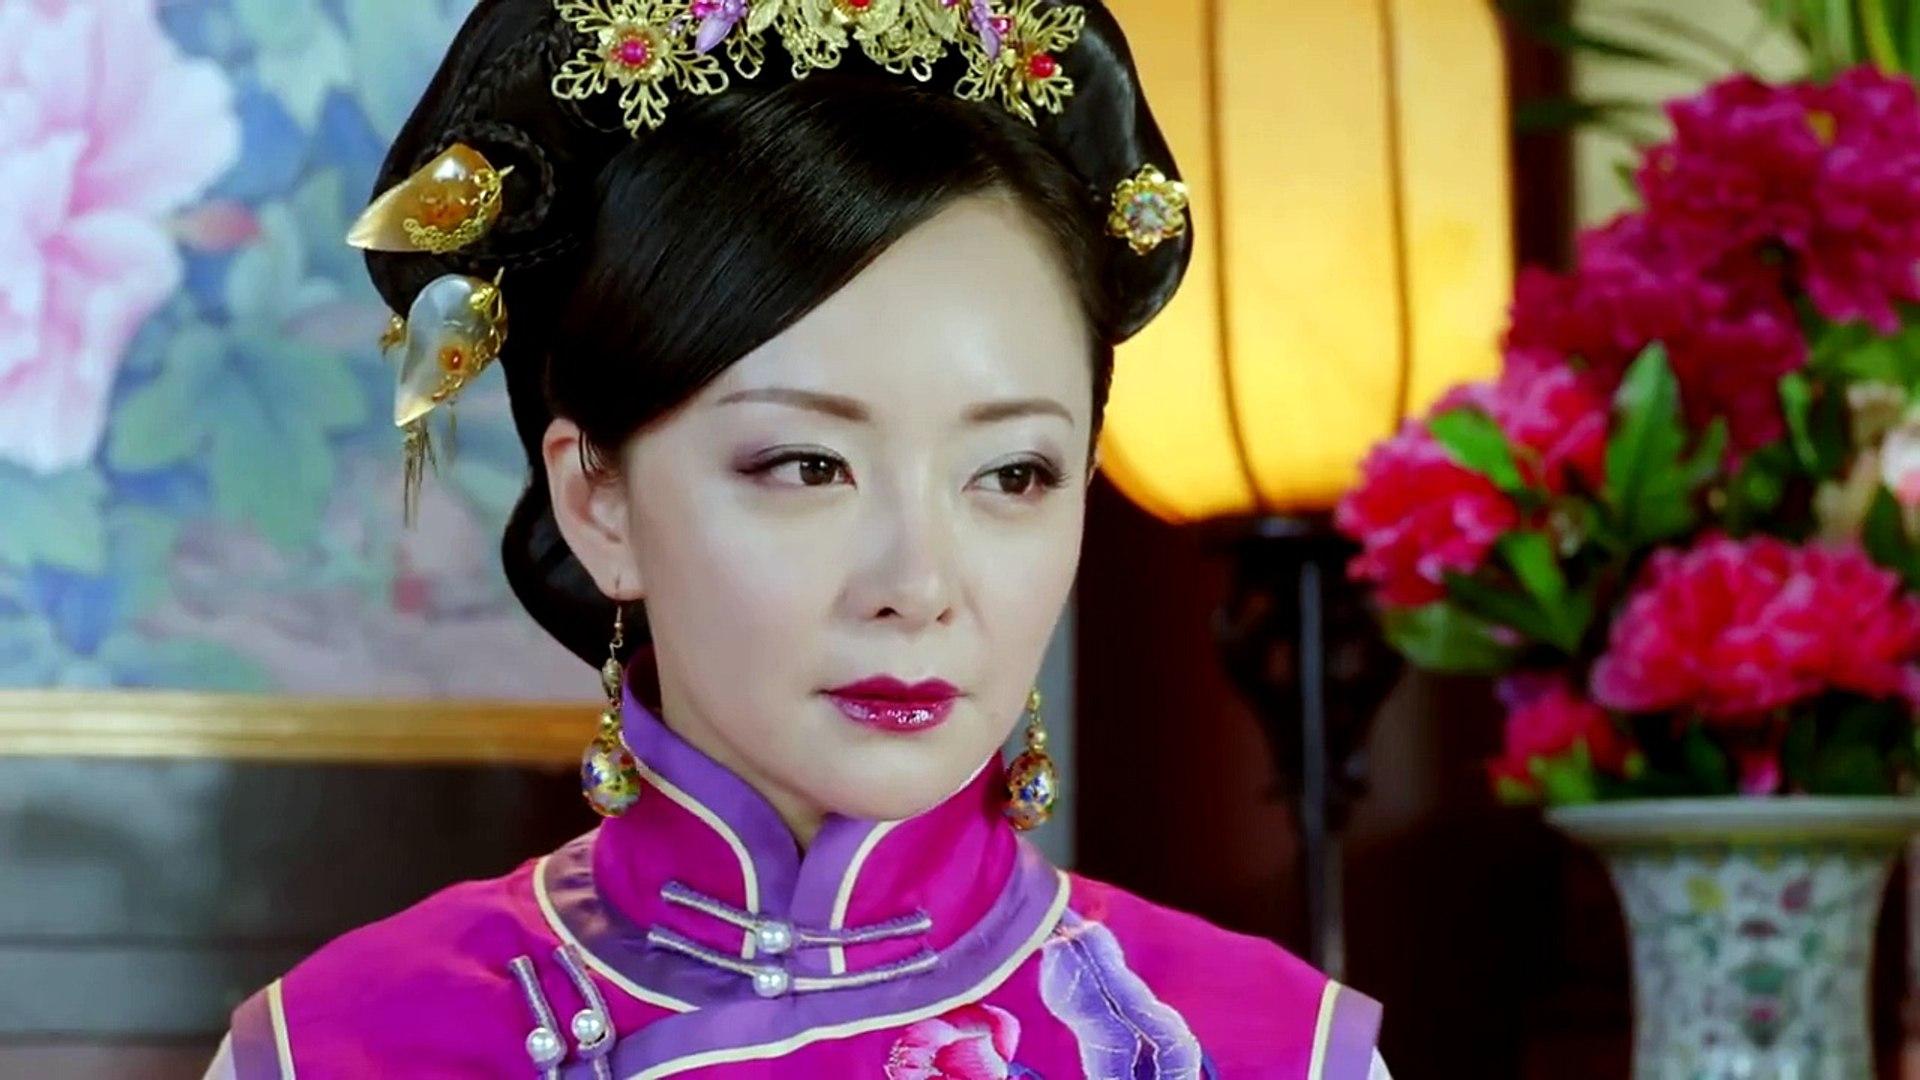 [ENG SUB] Rule the World Episode 2 EngSub | 独步天下 Du Bu Tian Xia Chinese  Drama 2017 With English Subtitles